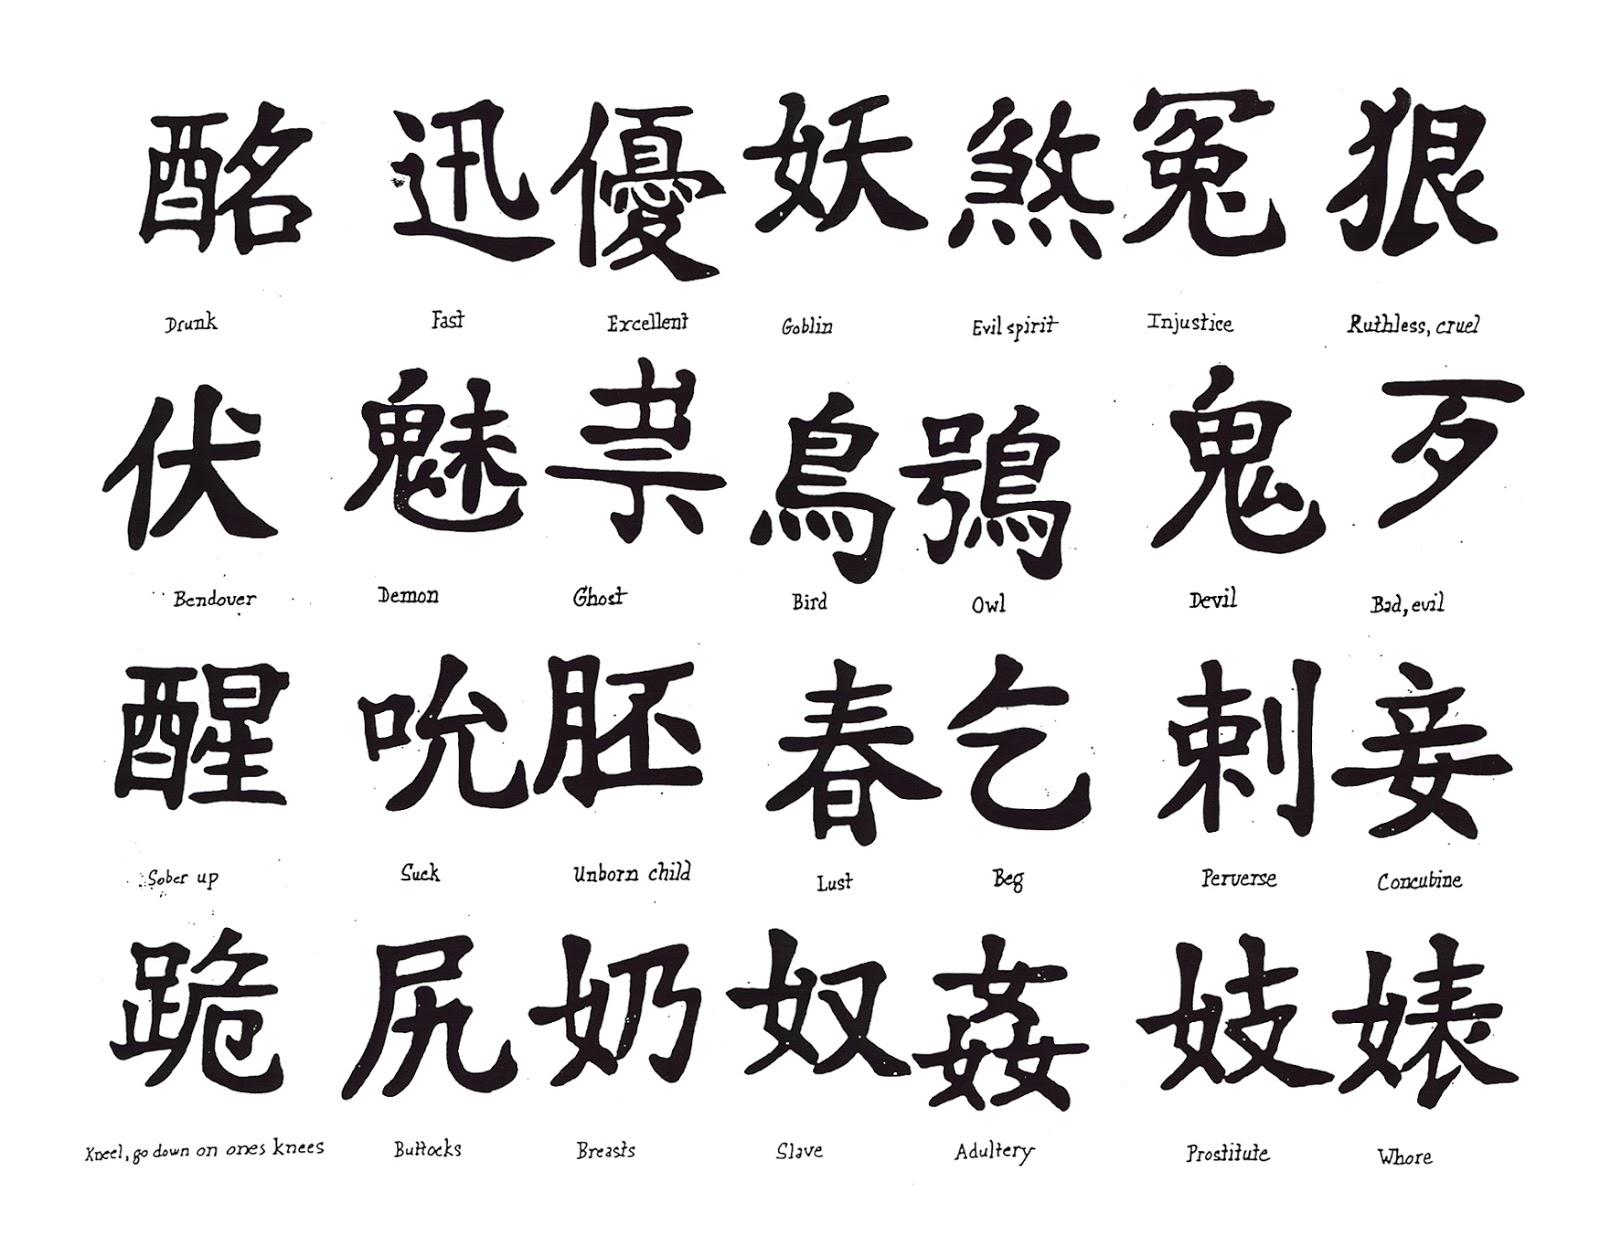 Tatoo Tatuajes Tatoo Tatuajes Chinos Palabras Nombre imagenes